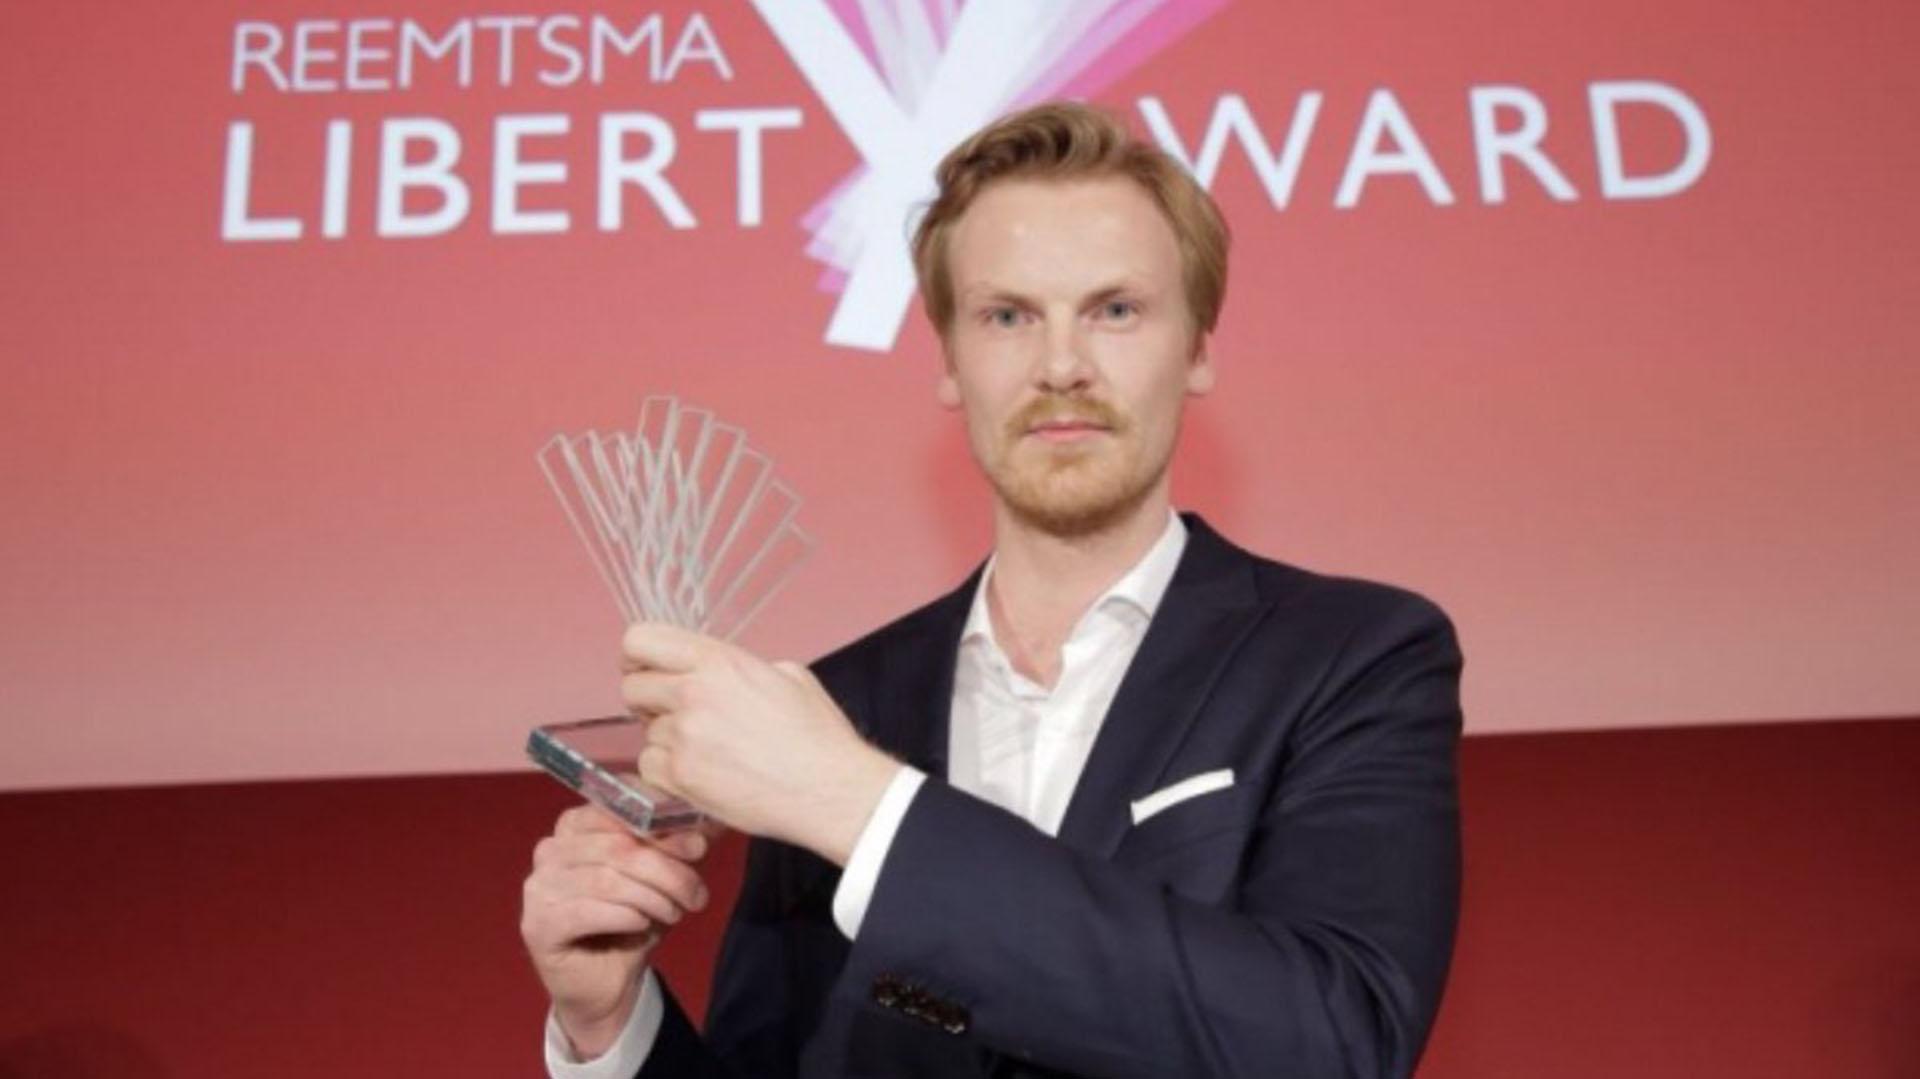 Claas Relotius, tras ganar el Reemtsmat Liberty Award en 2017 (@JetztHallo)